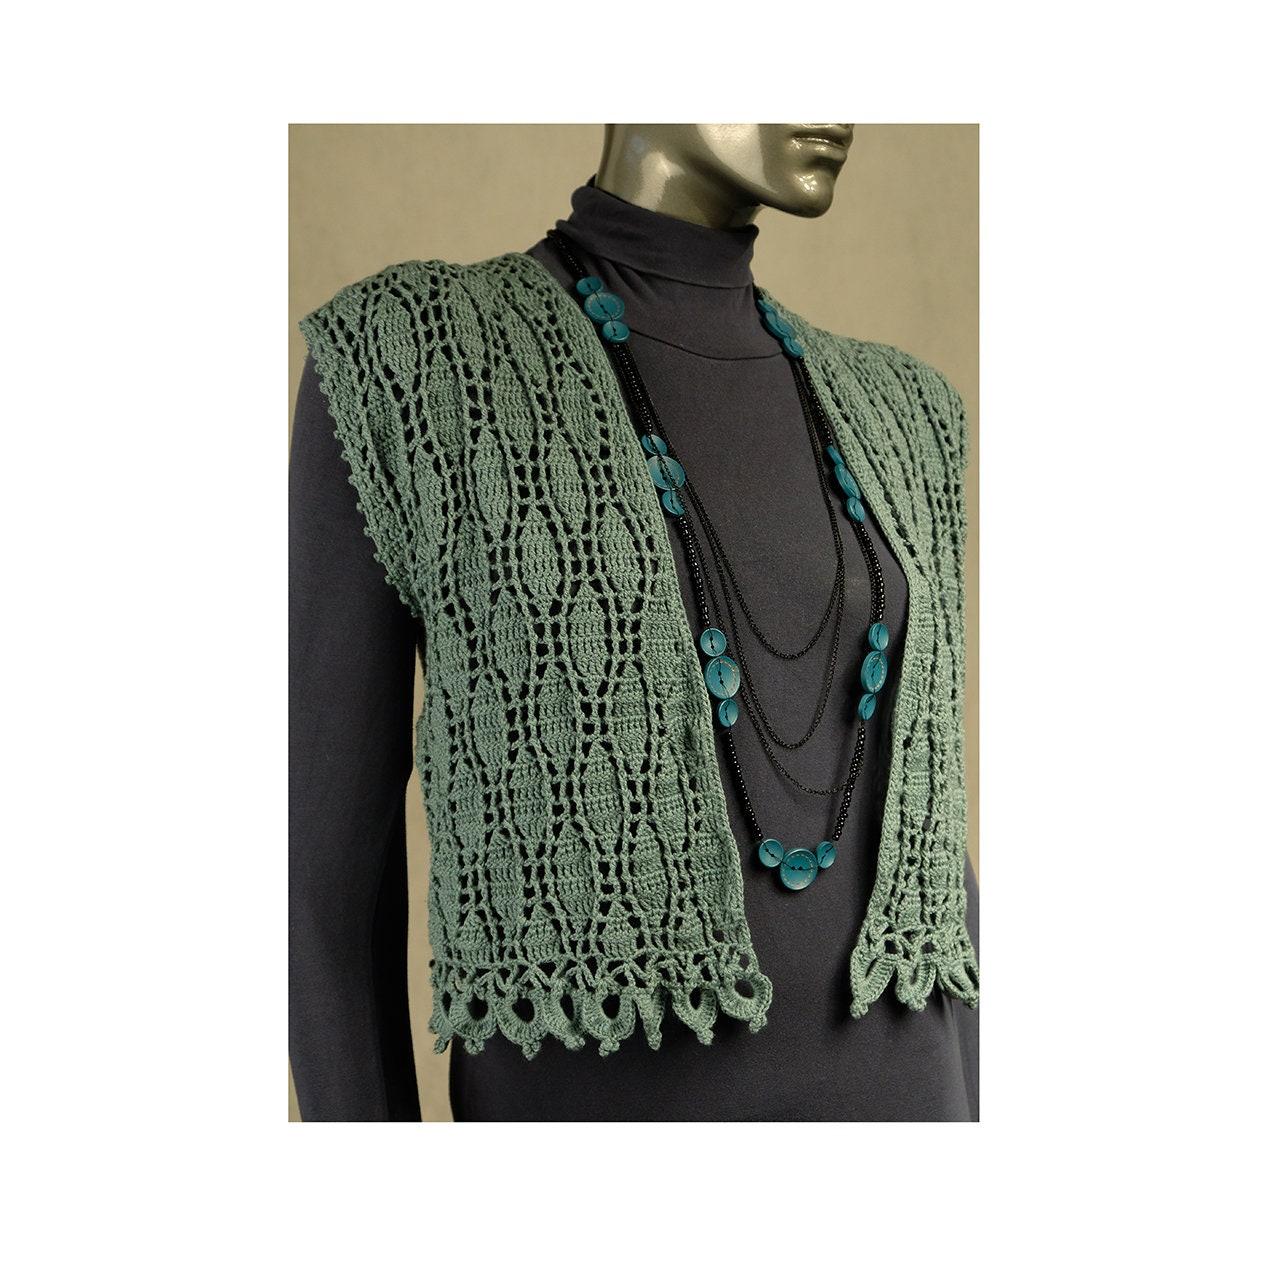 f711db91581f29 Waistcoat oversize crochet Top loose open front green gray